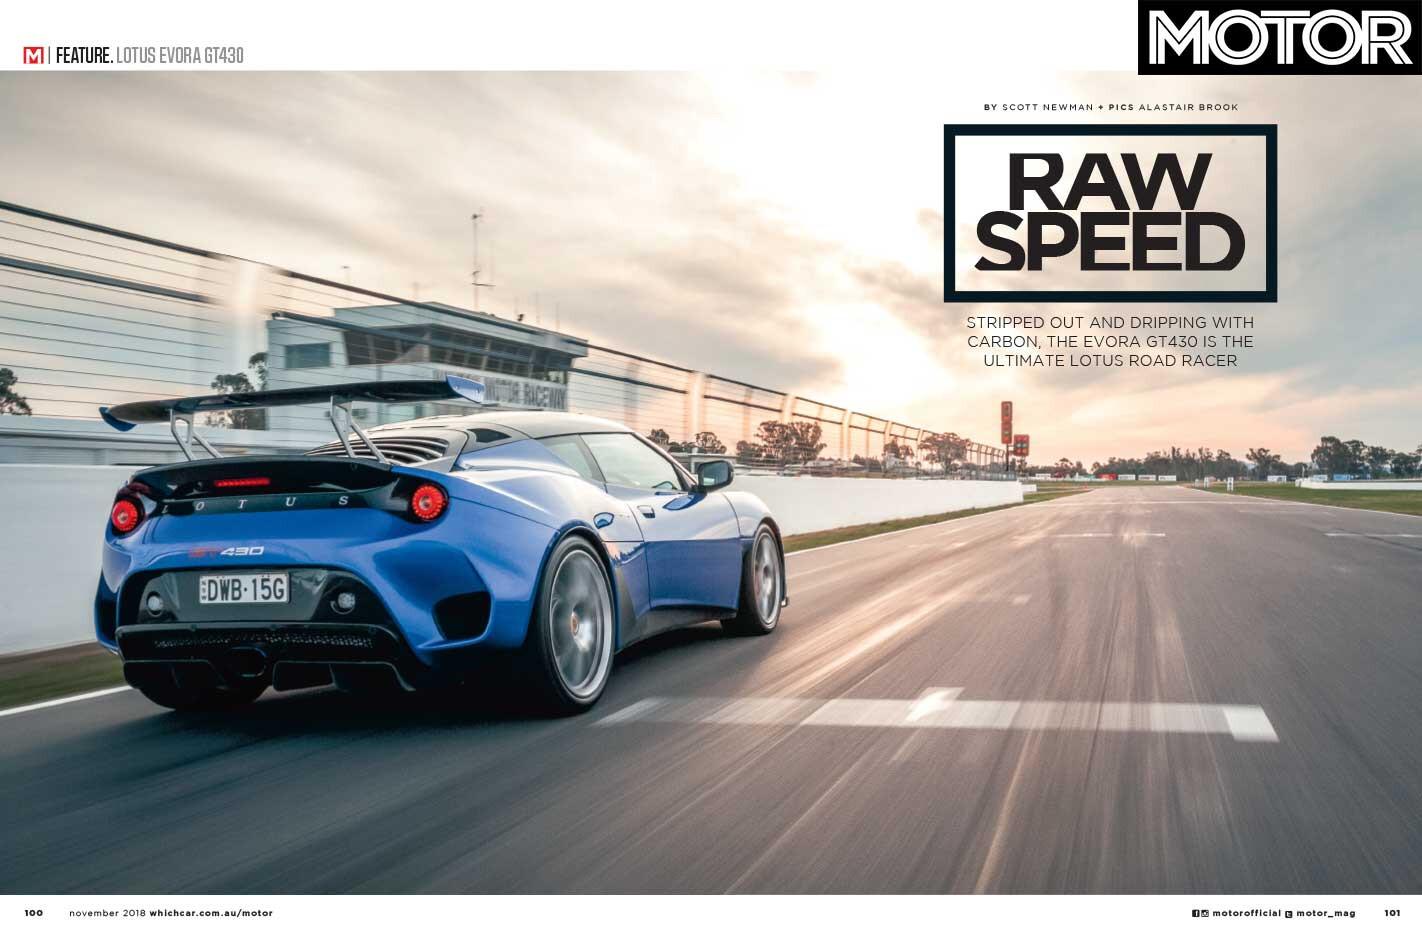 MOTOR Magazine November 2018 Lotus Evora Jpg